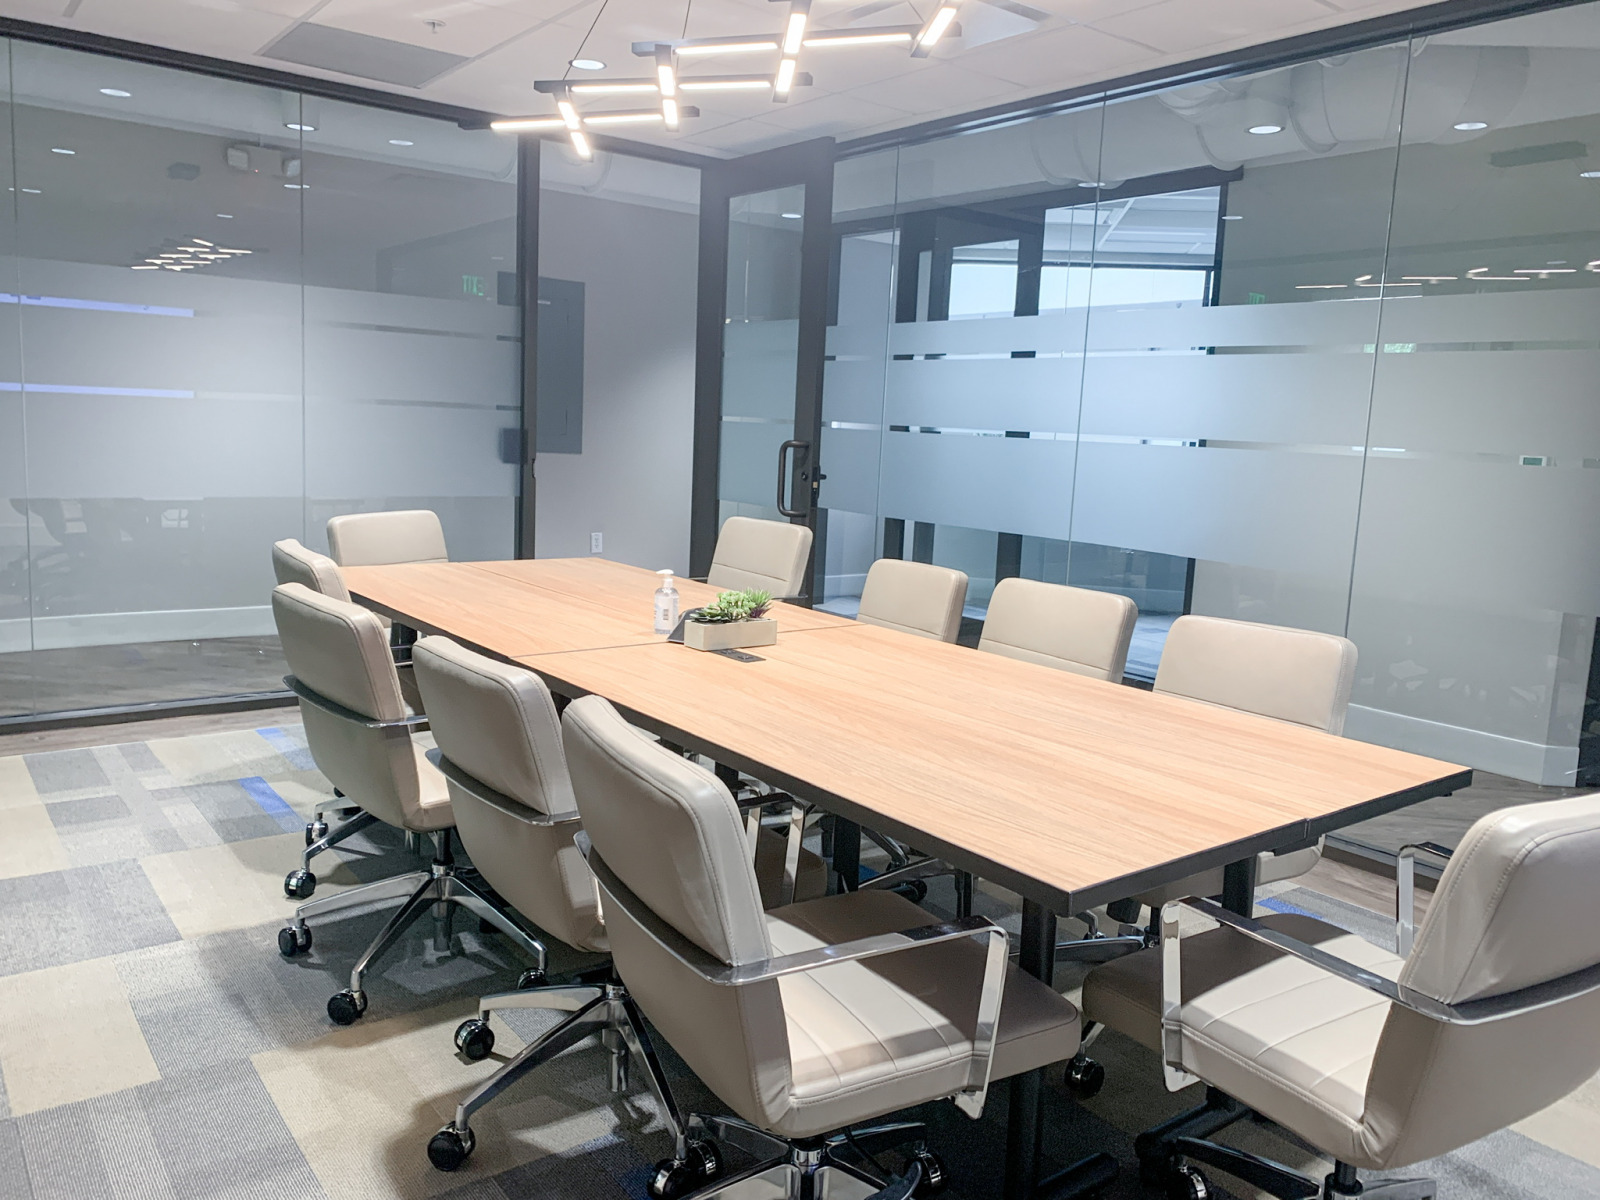 northwood_meeting-room